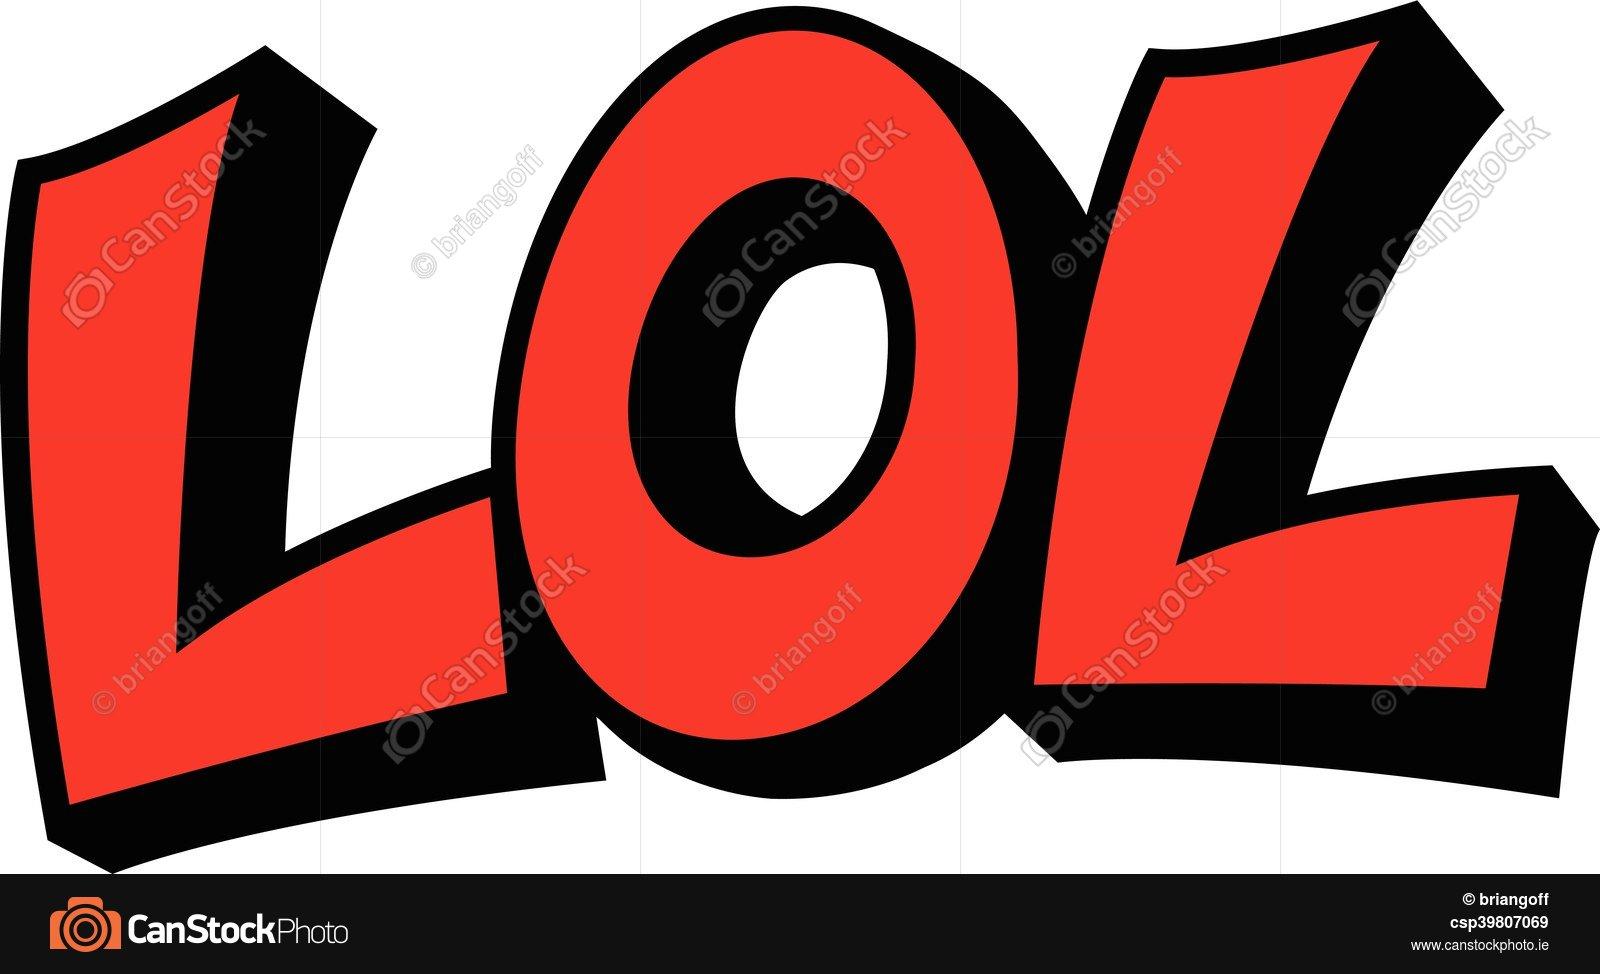 1600x974 Lol Cartoon Lettering. Lol Laugh Out Loud Cartoon Lettering Clip